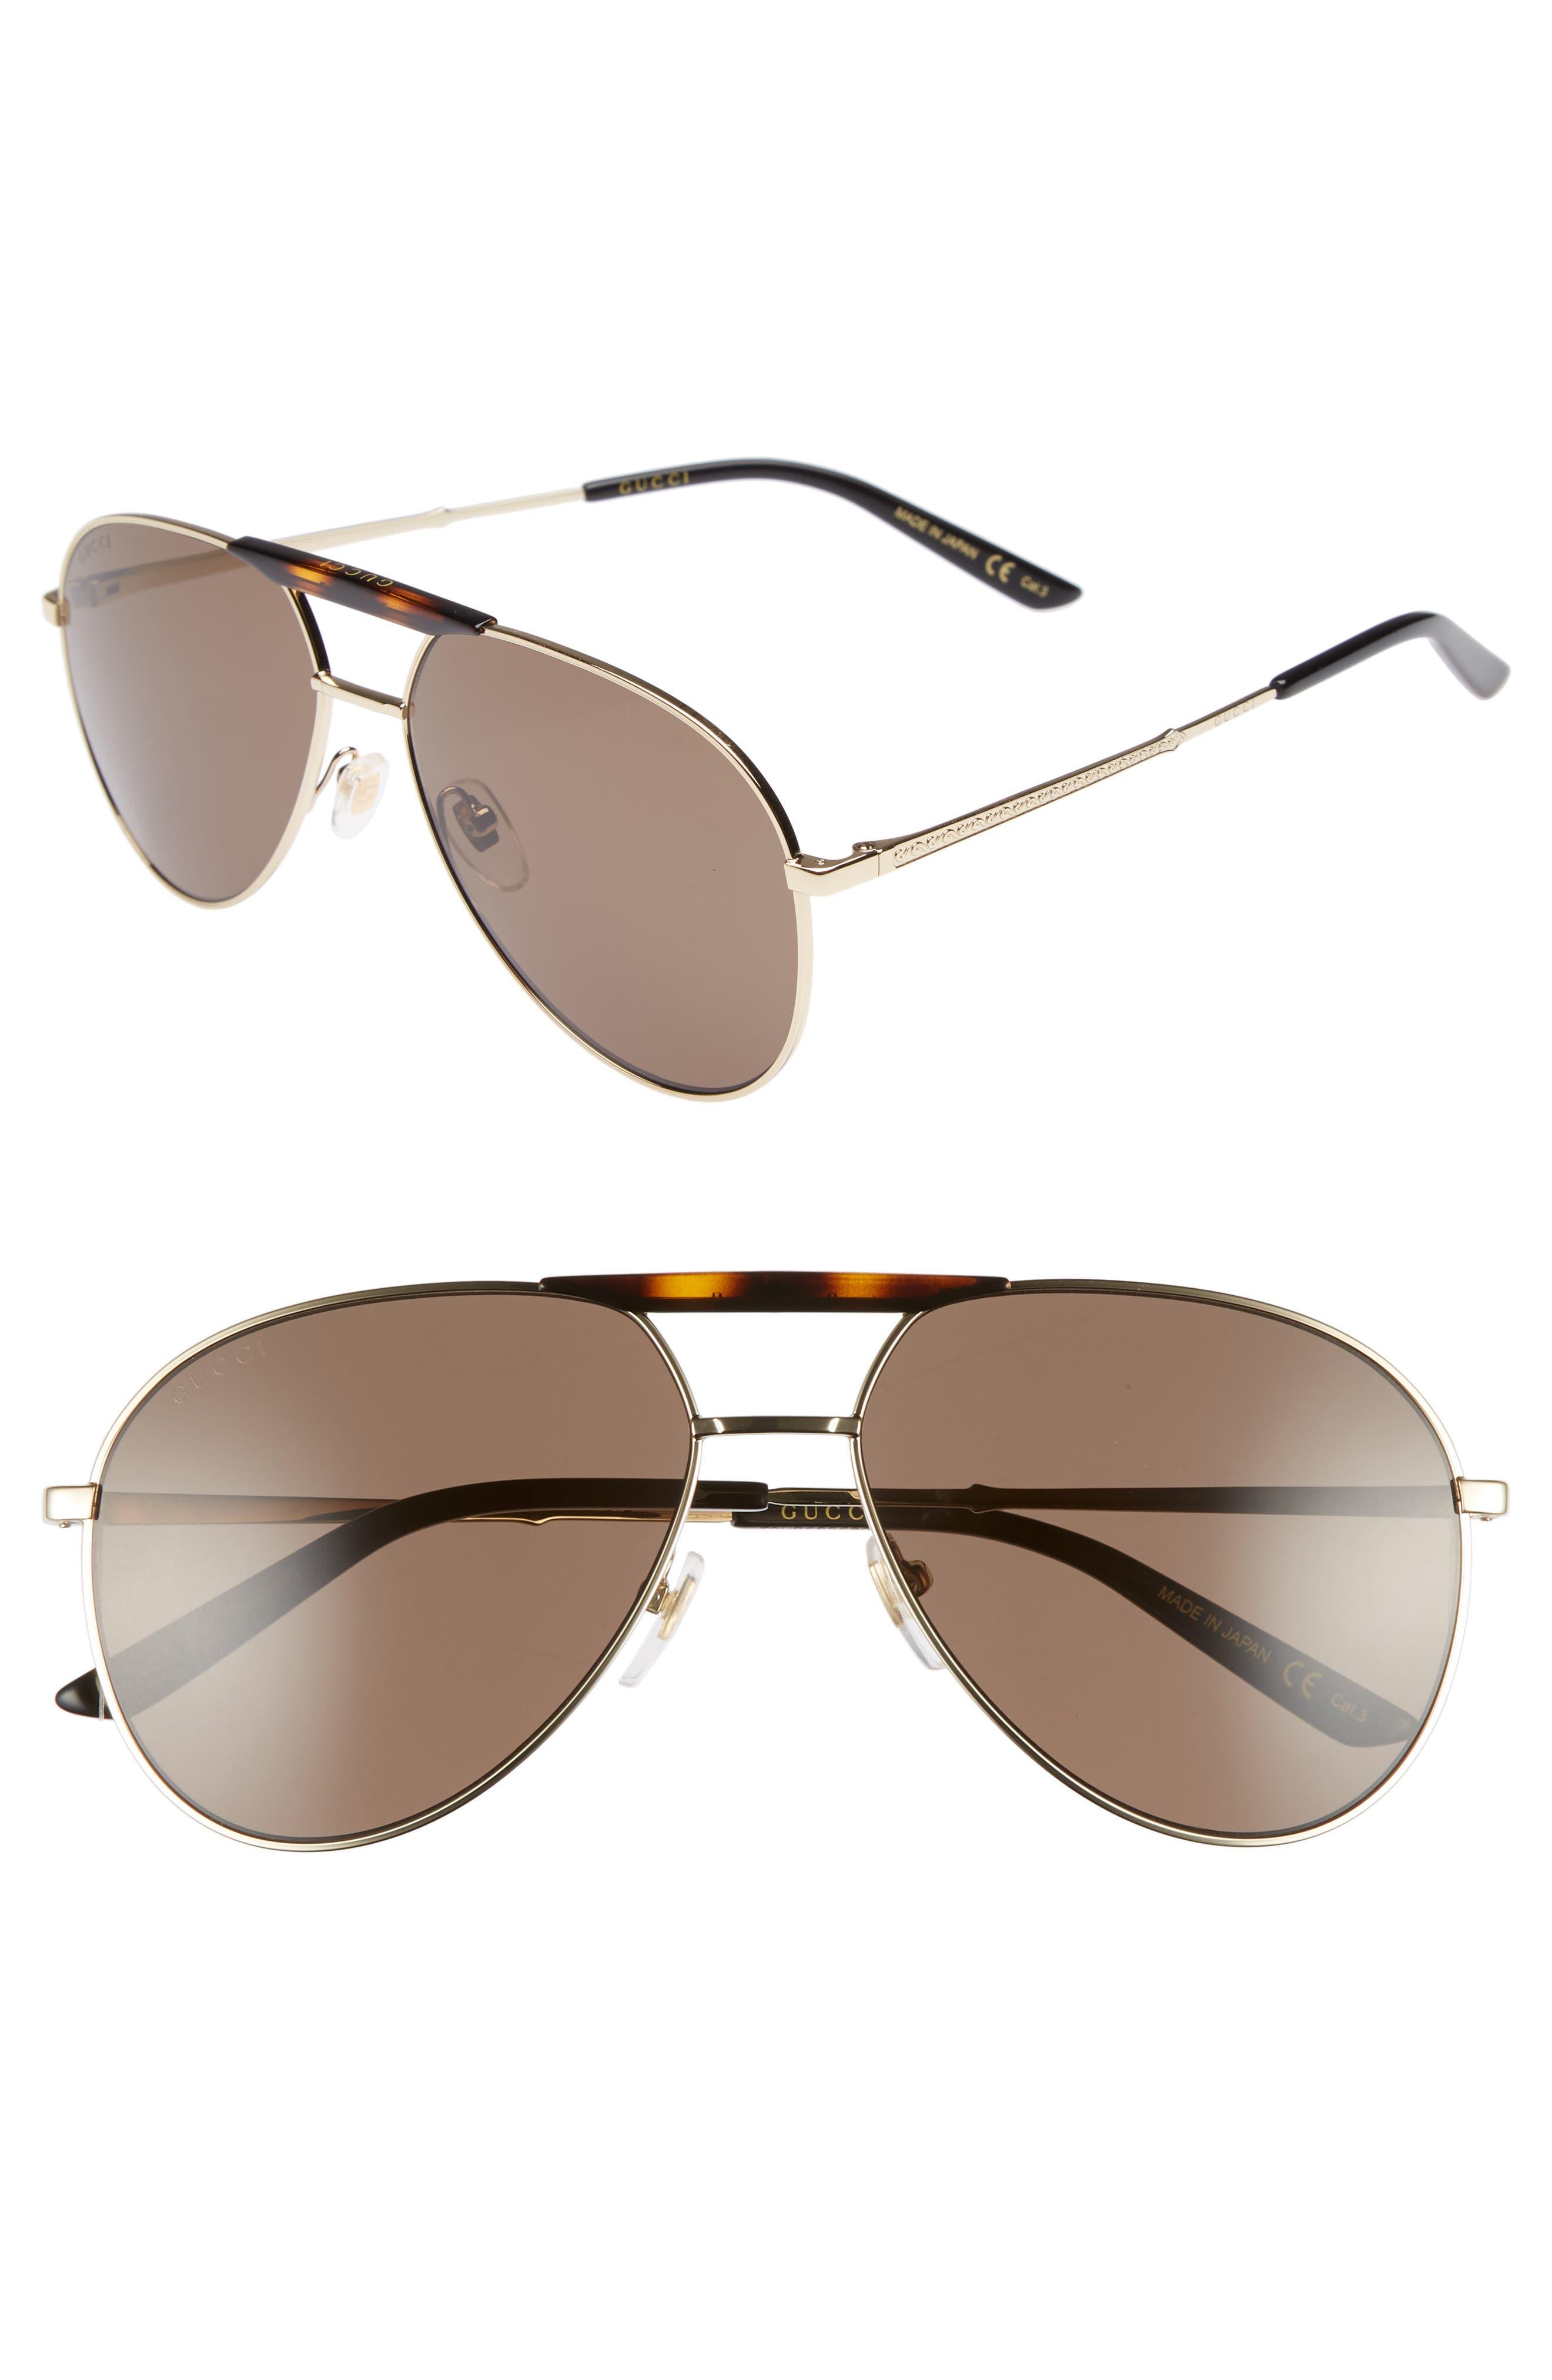 GUCCI Cruise 59mm Aviator Sunglasses, Main, color, GOLD/ BLACK